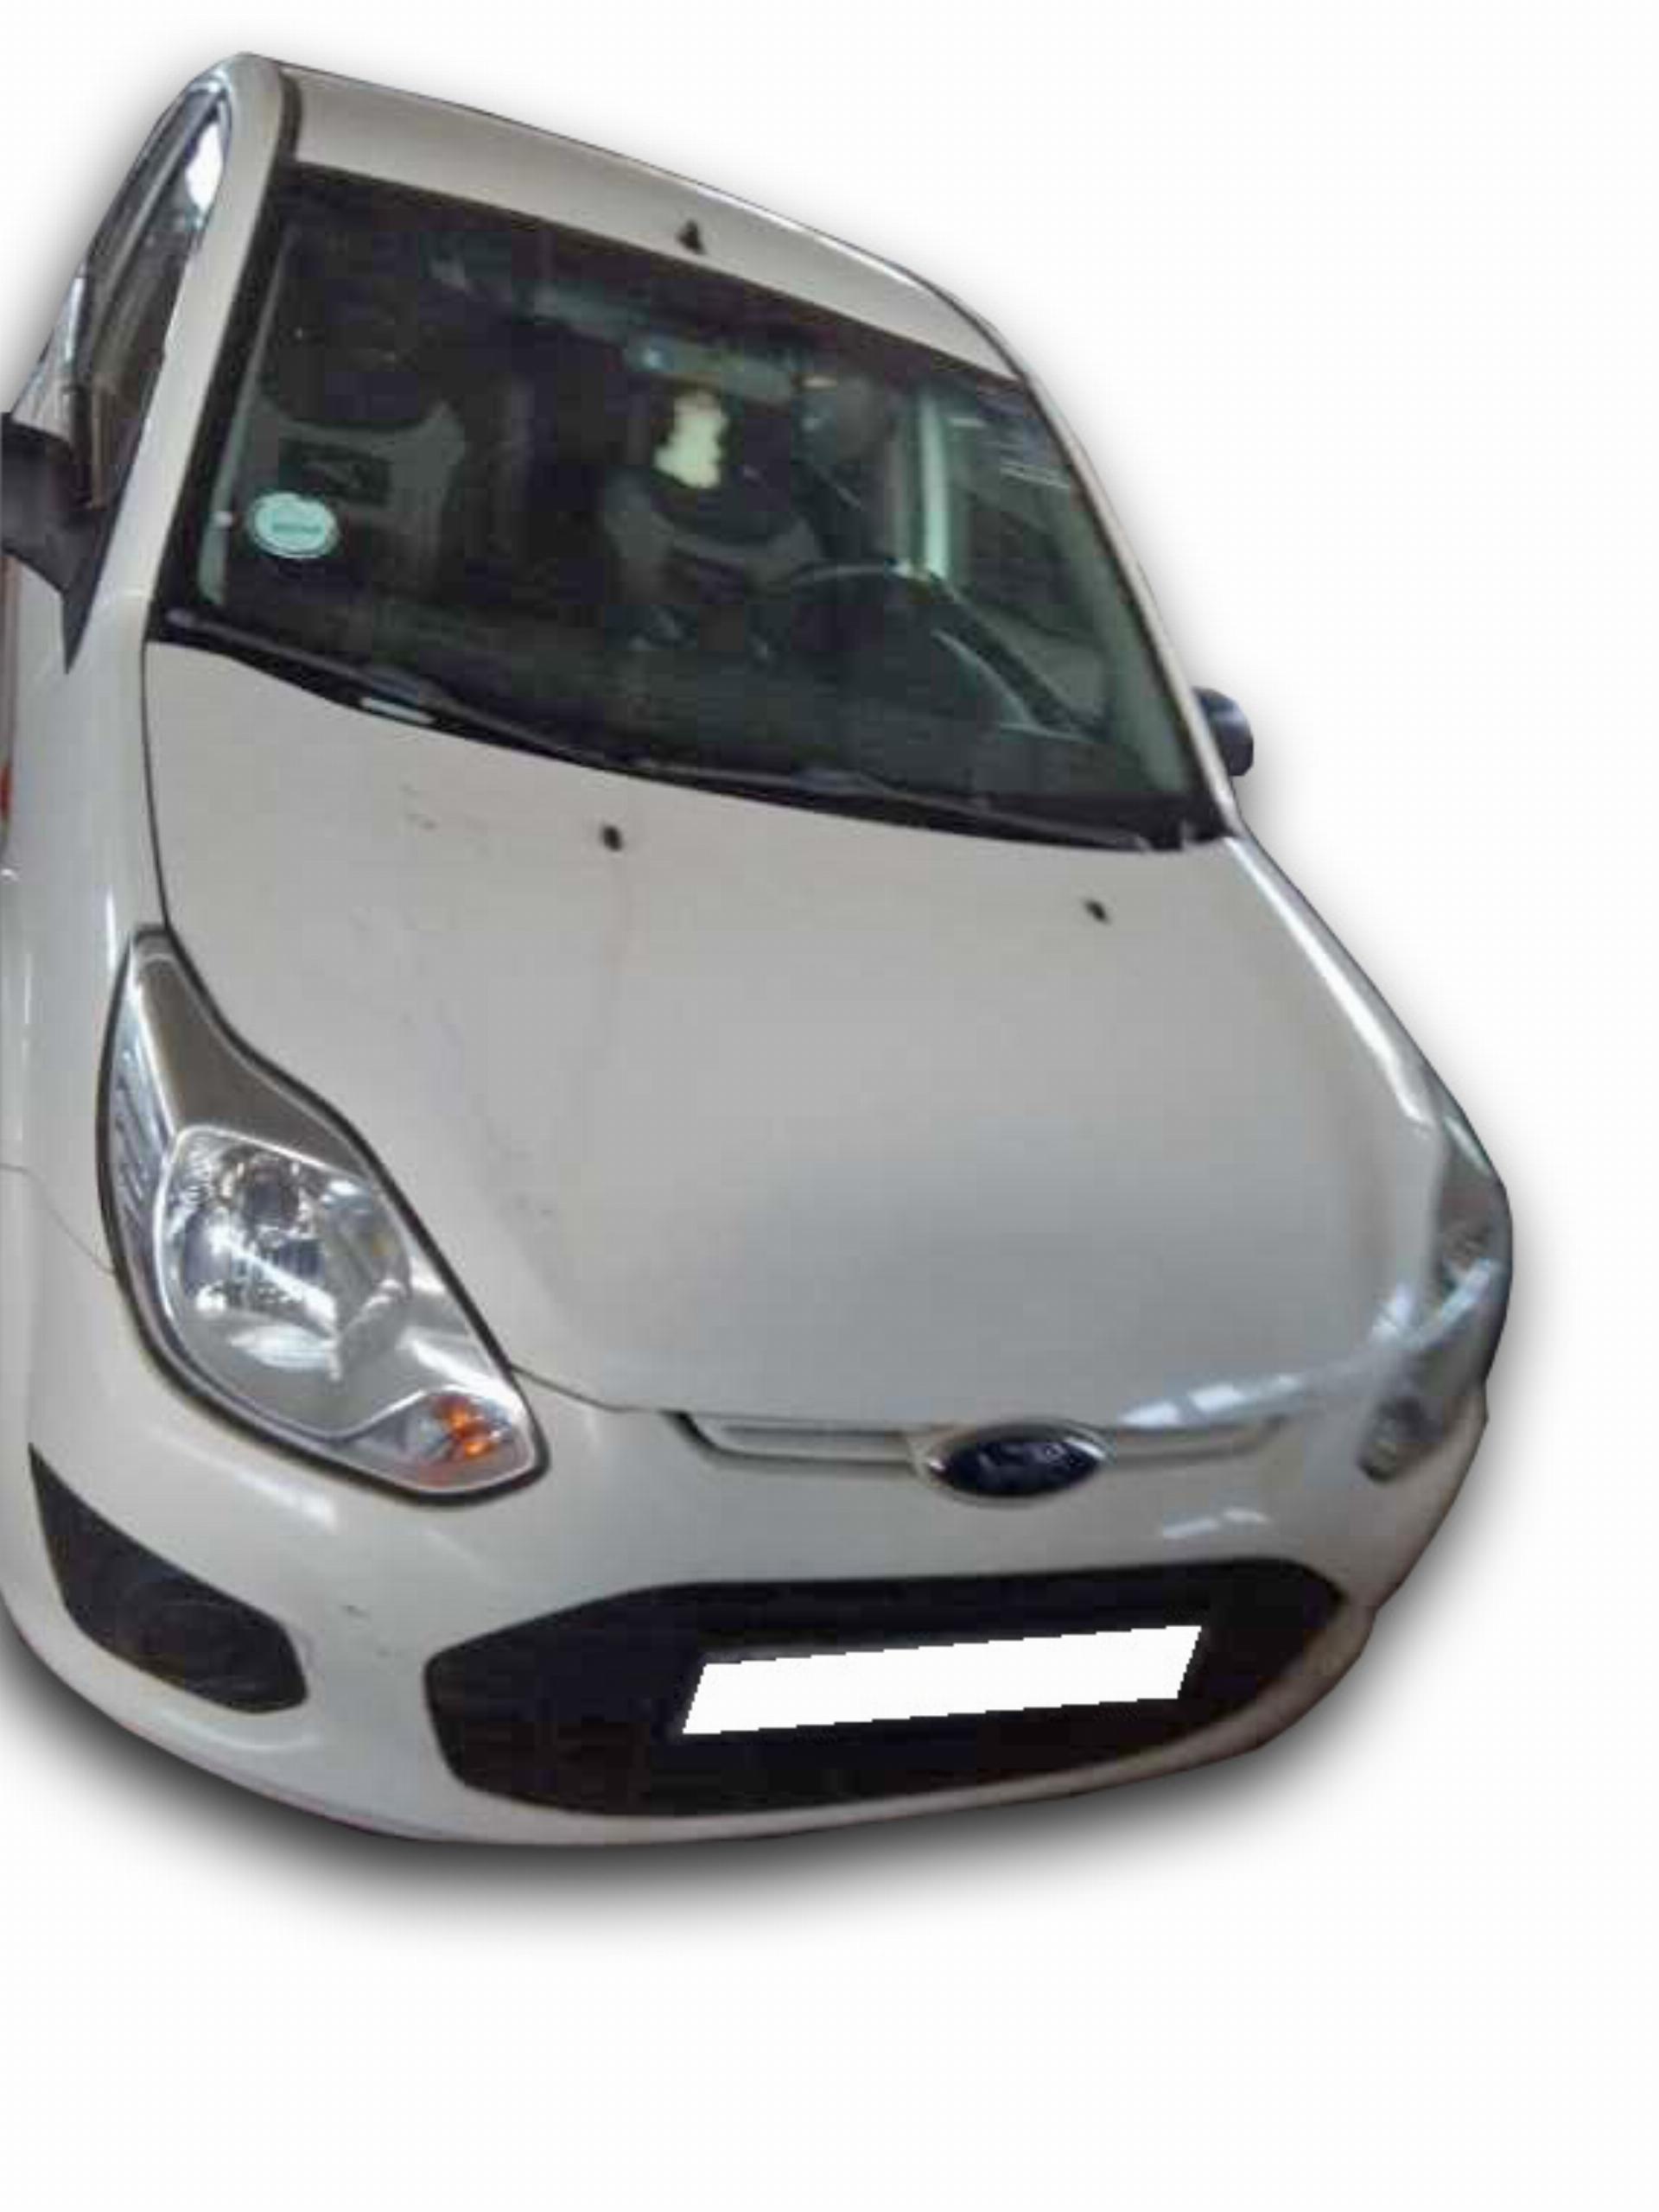 Ford Figo 1.4 Amb